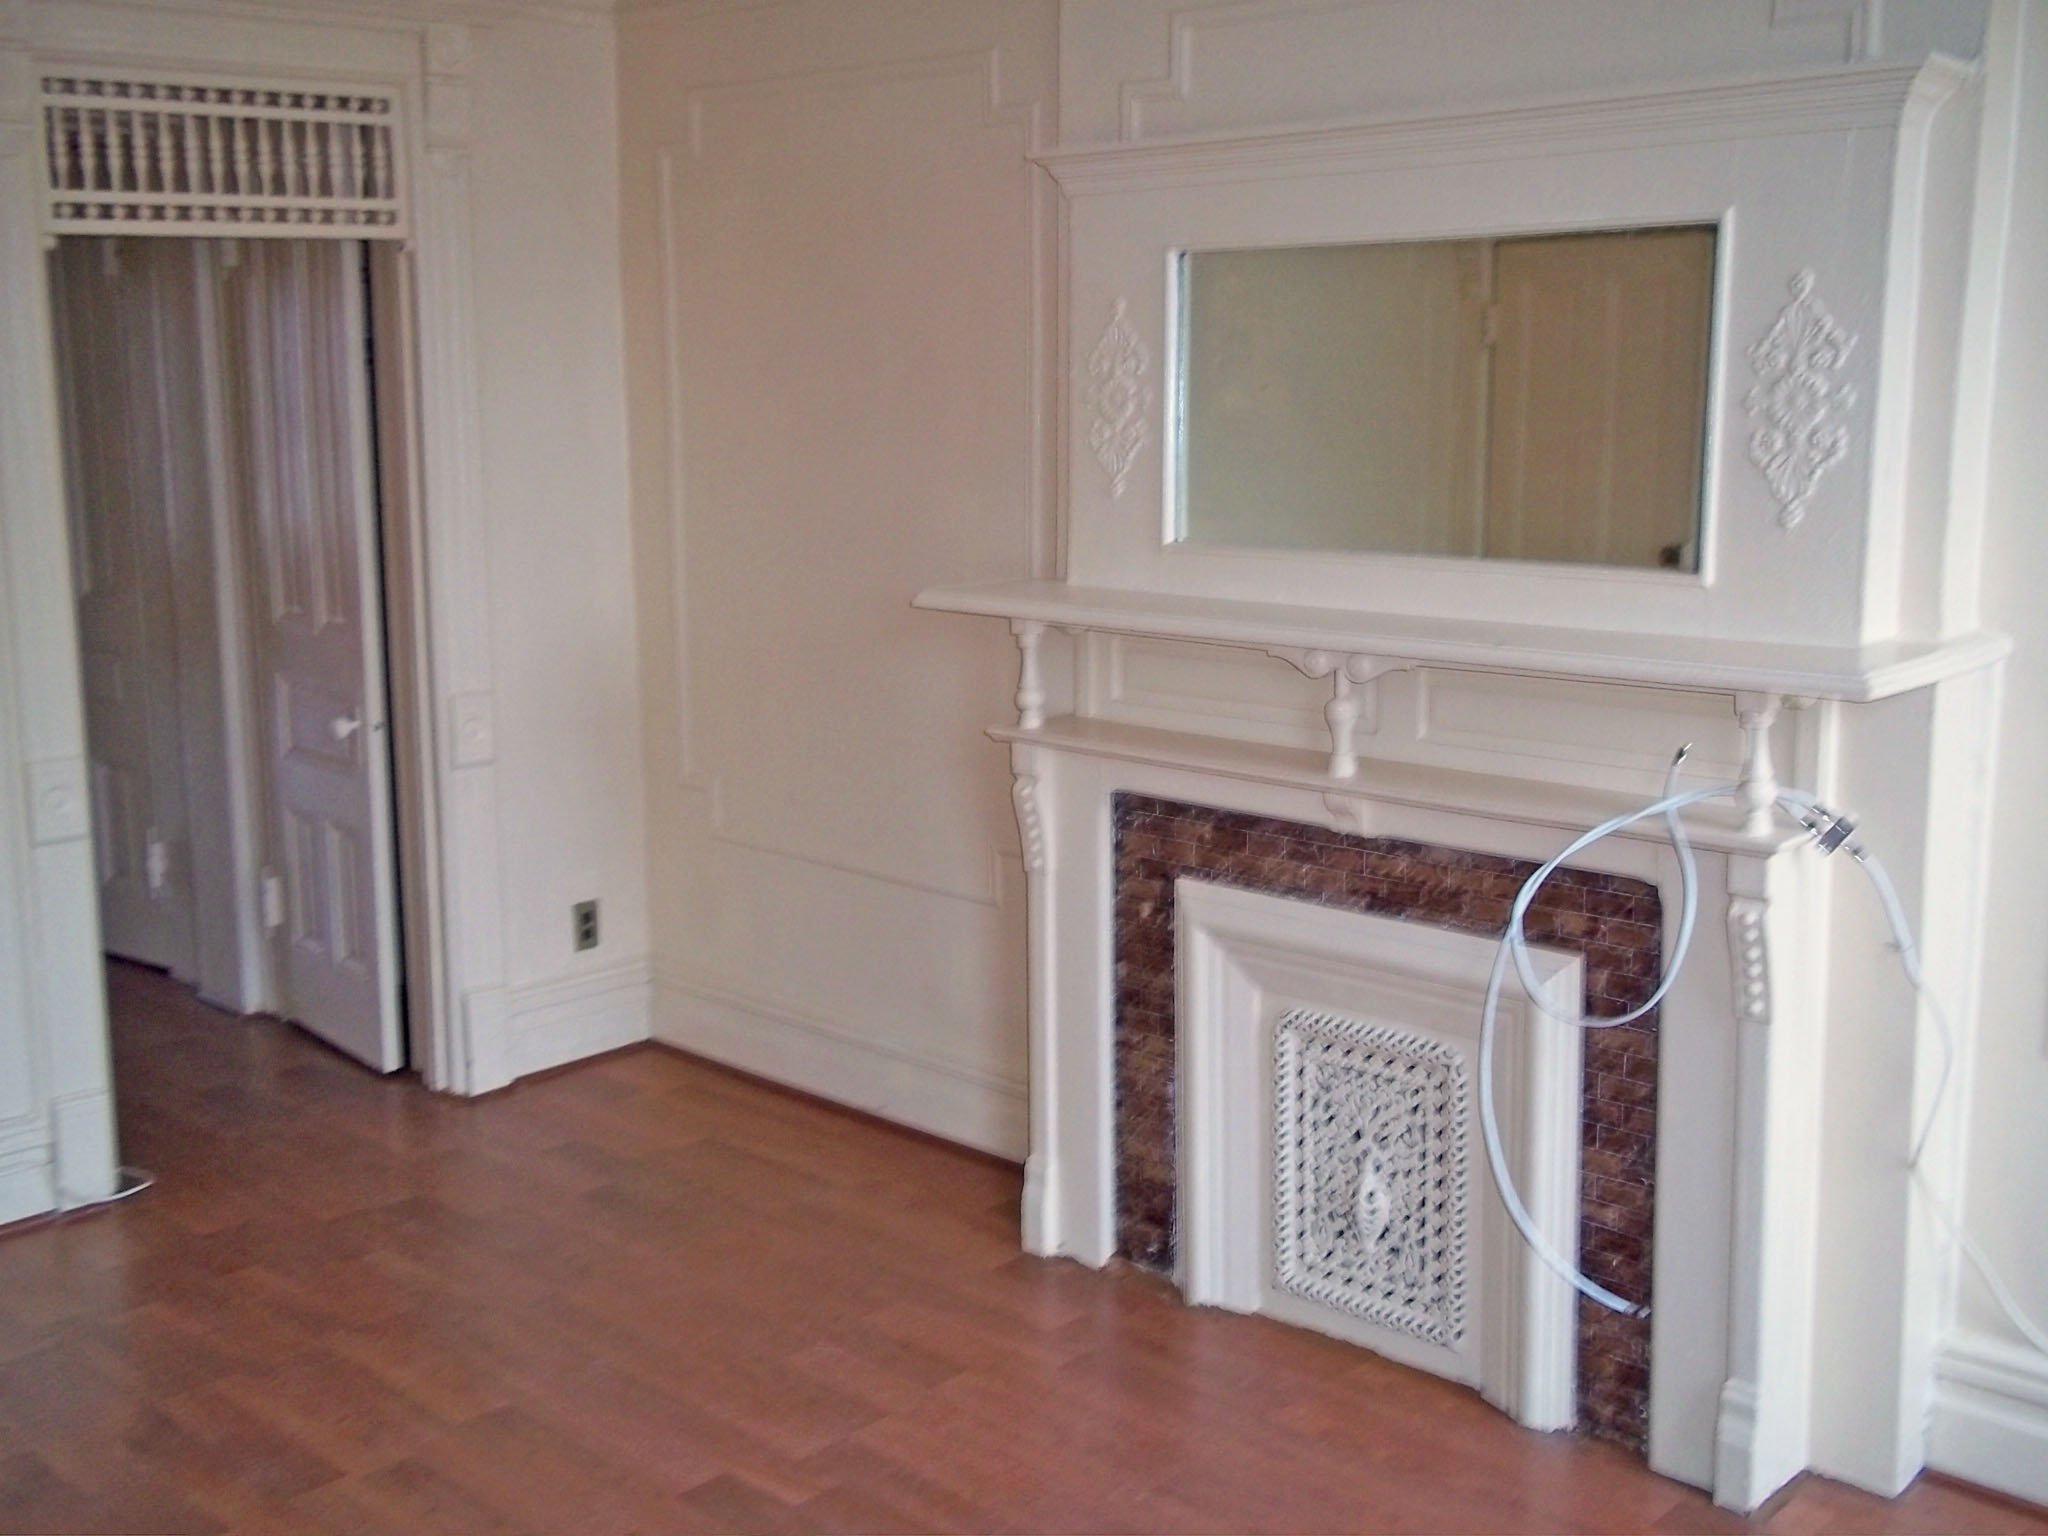 New York Apartment 1 Bedroom Al In Brooklyn Ny 16440